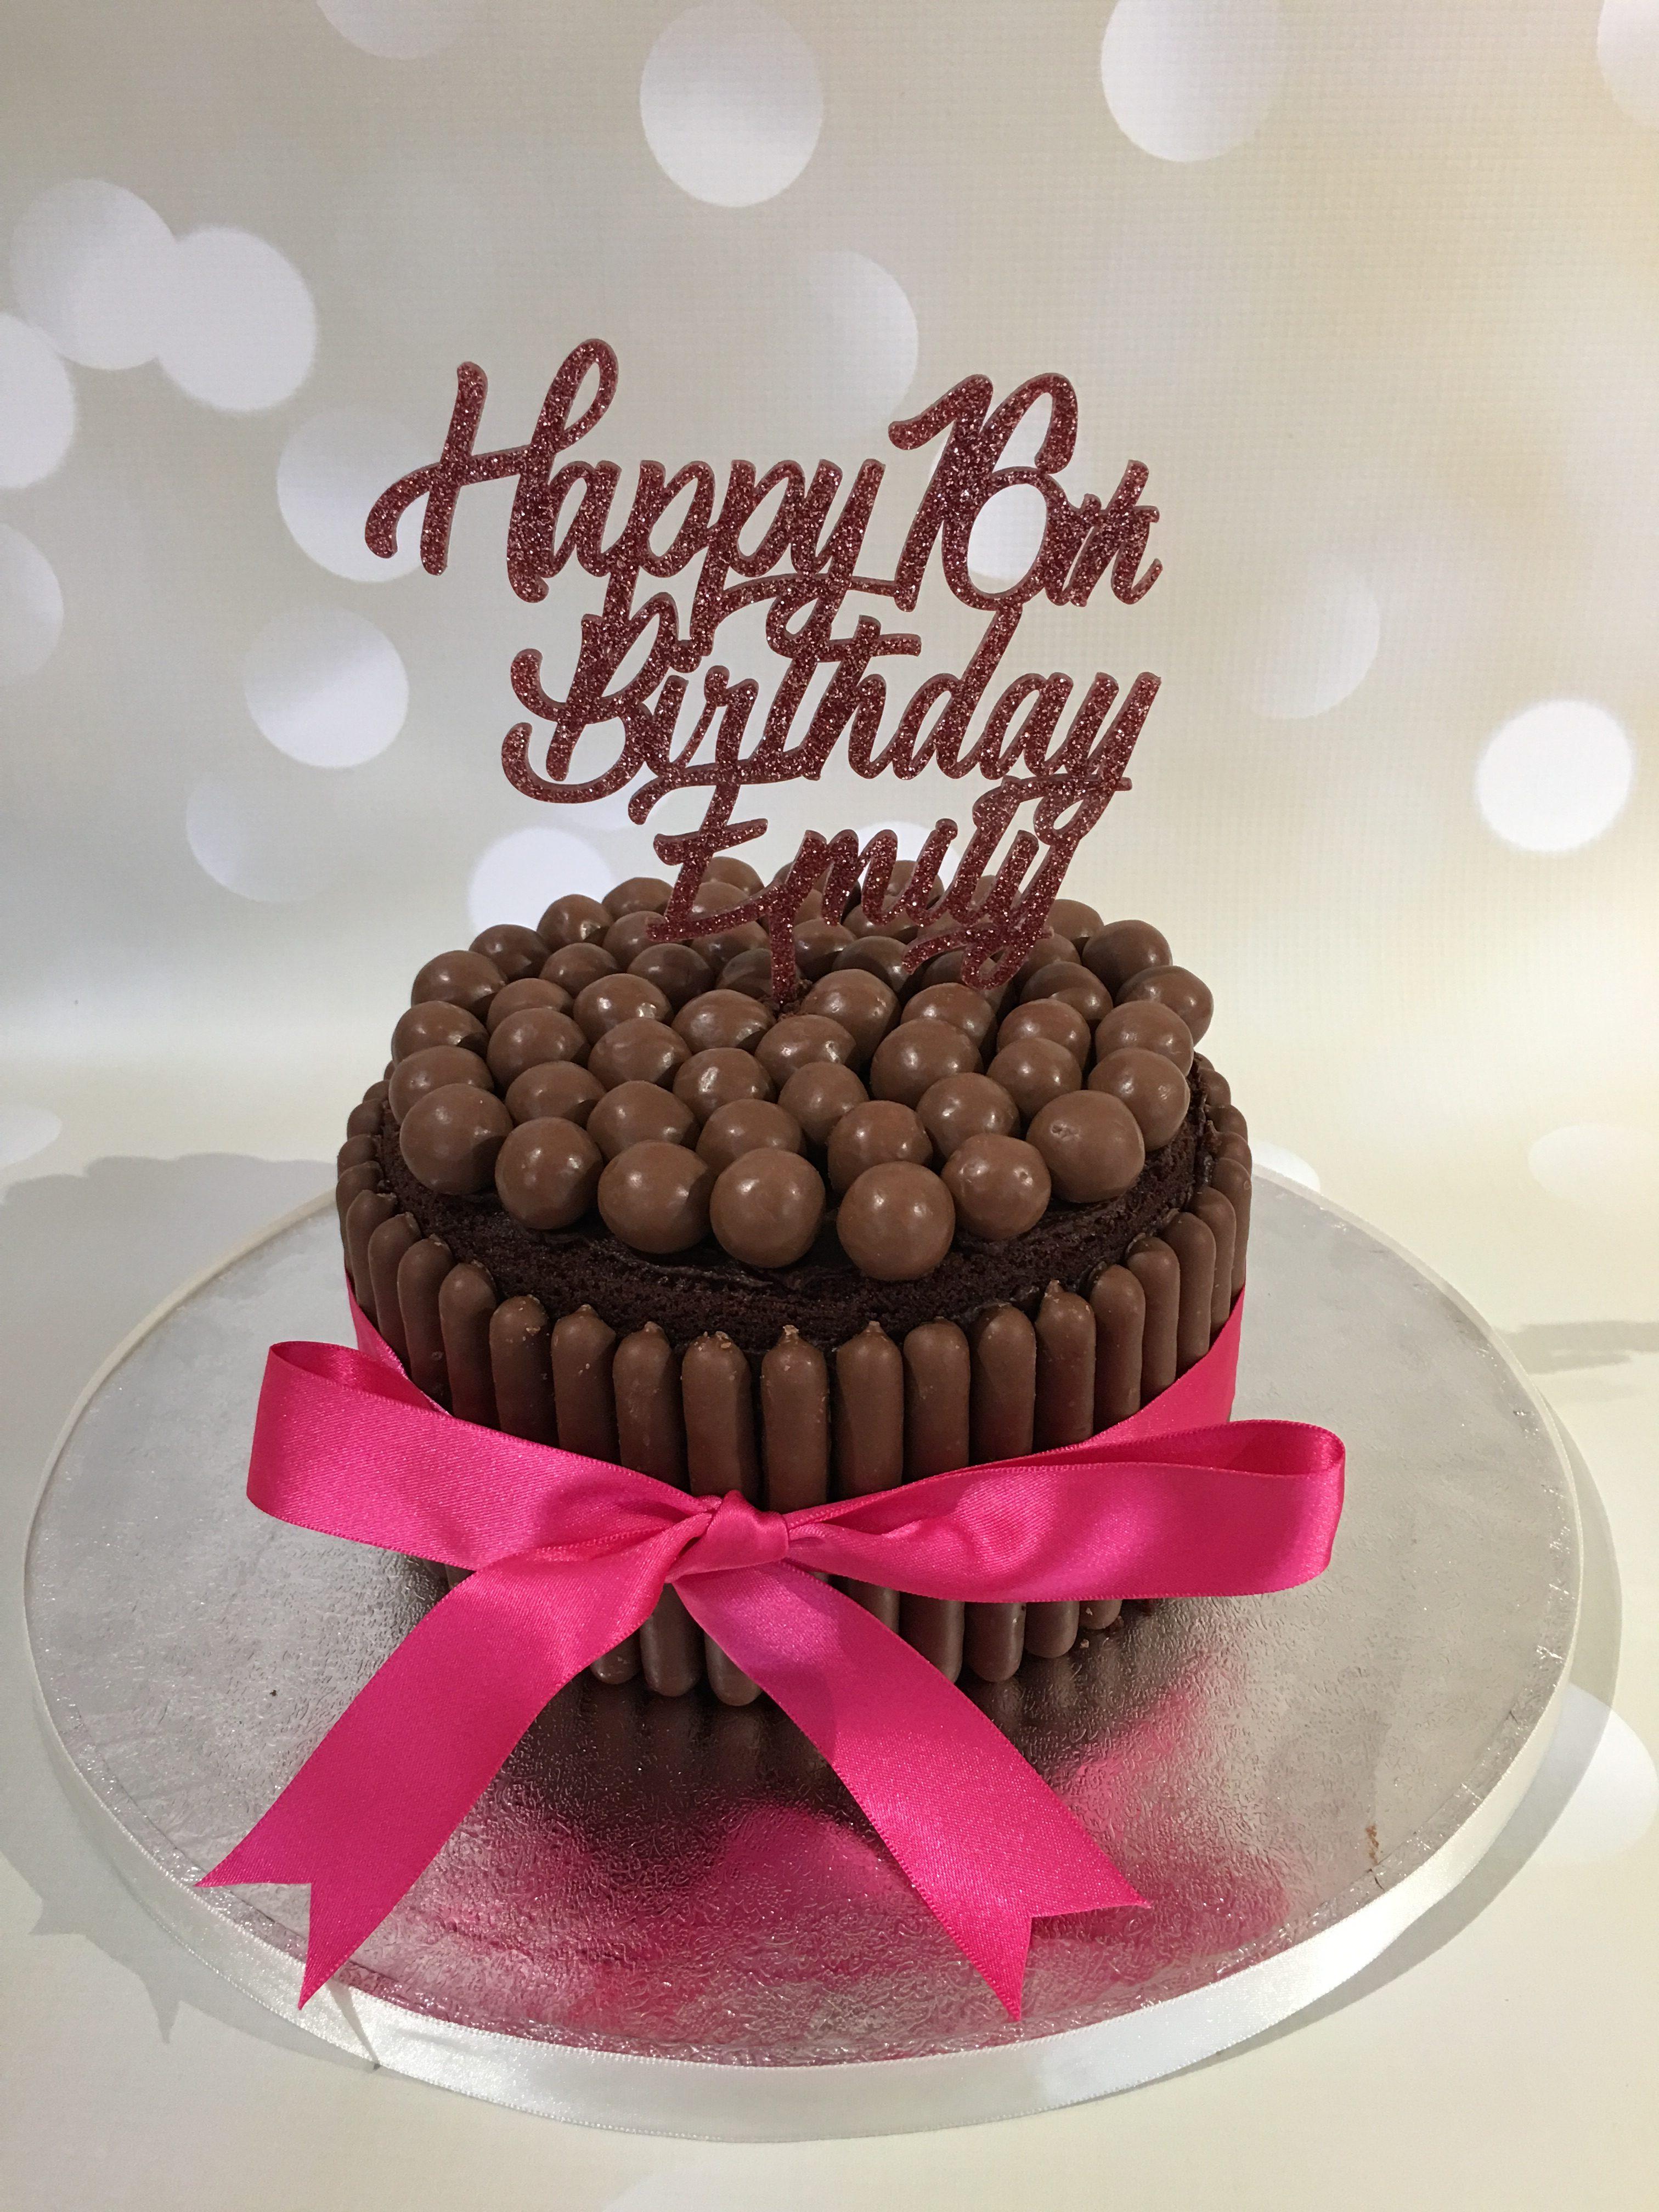 Chocolate fest cake